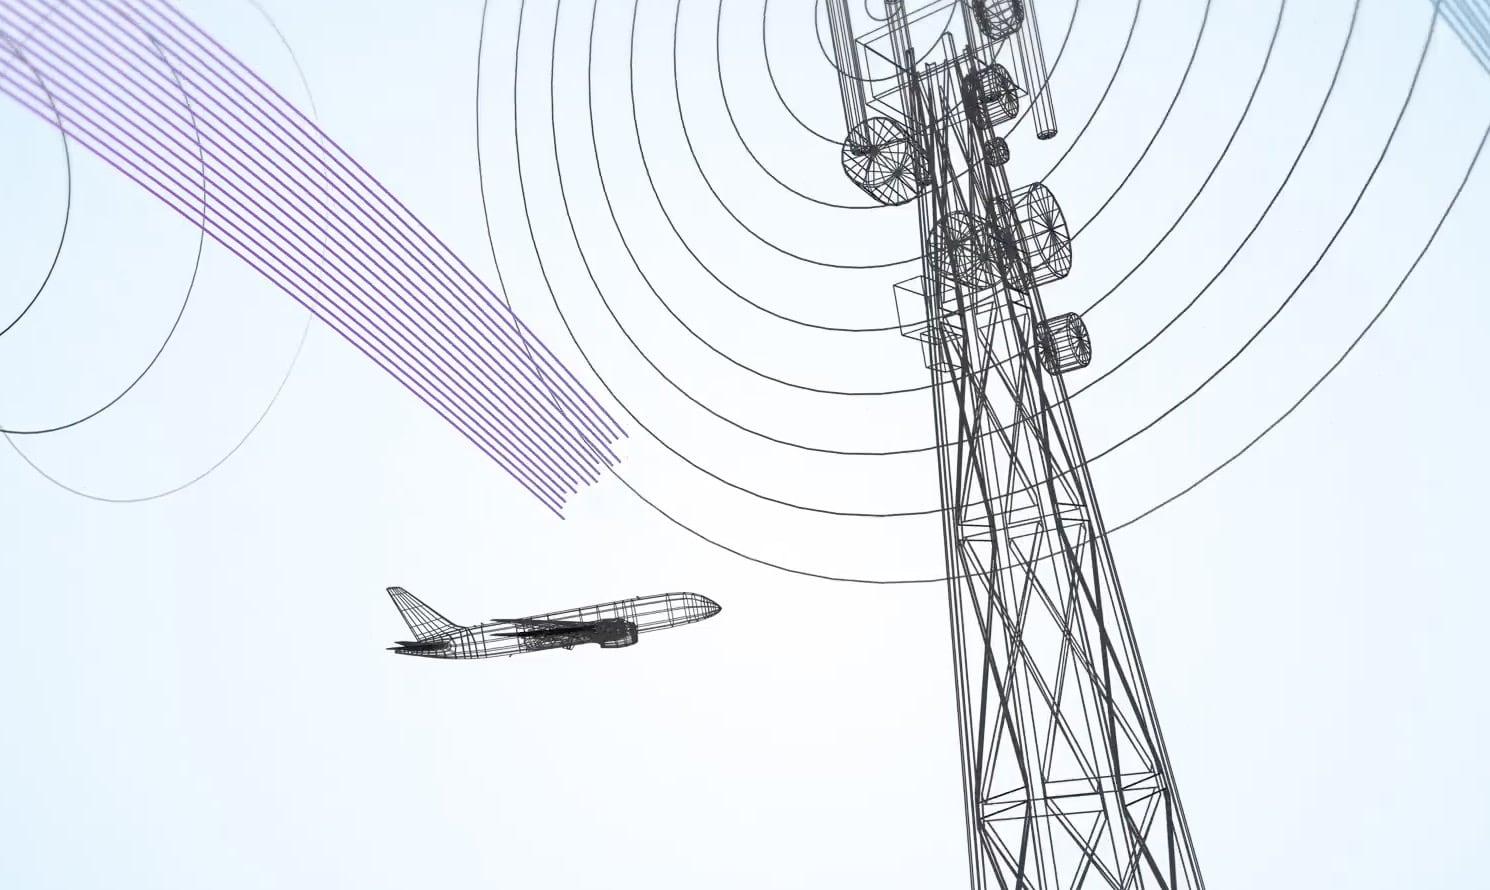 Telekom hat Onboard-Internet-Netz EAN fertiggestellt